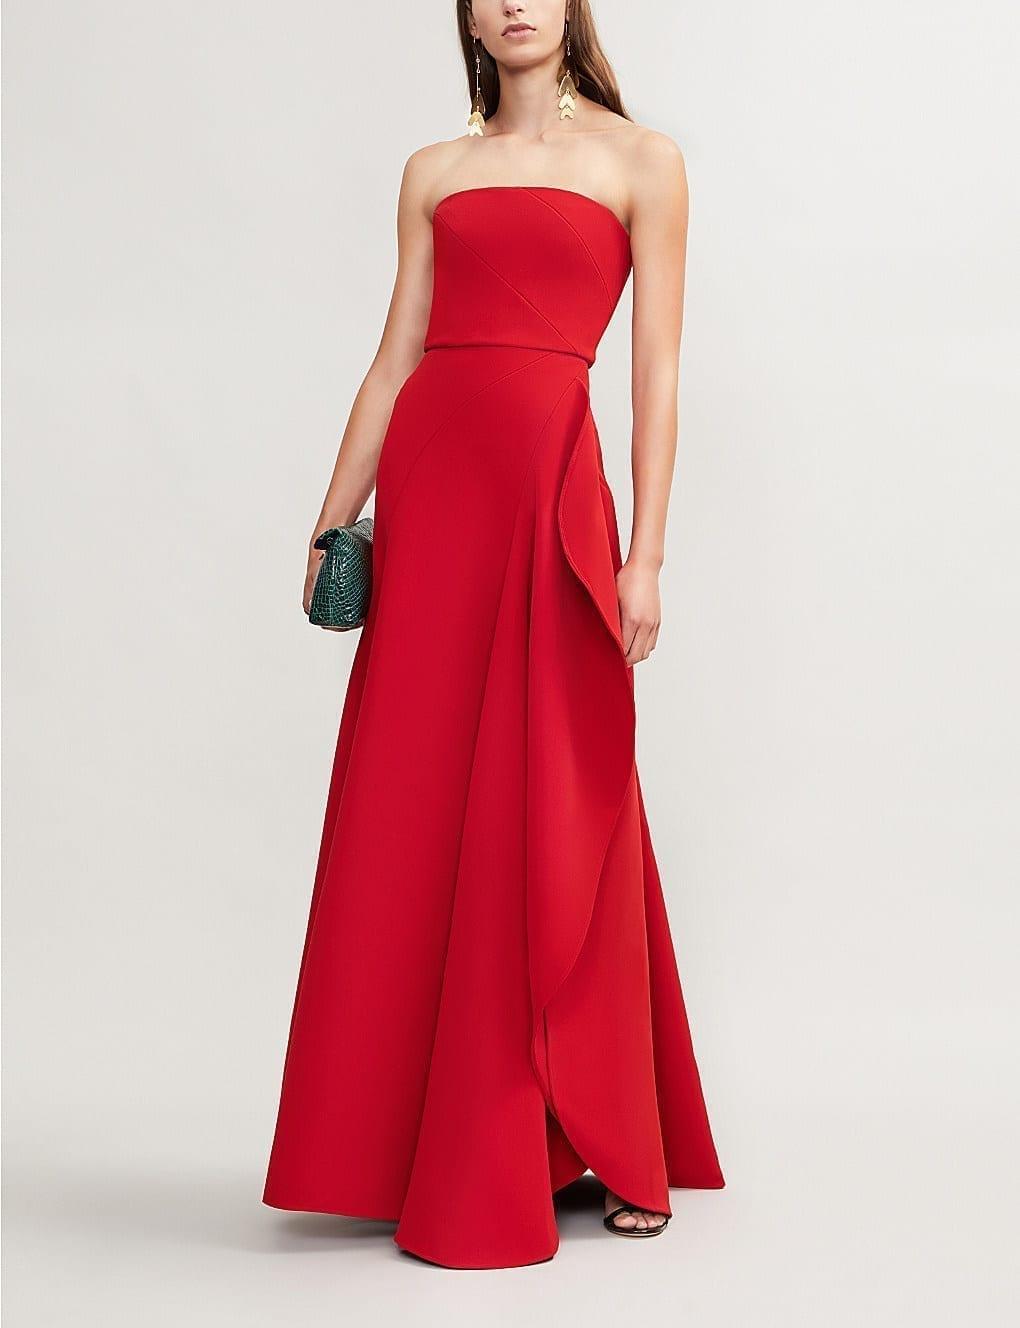 ELIE SAAB Strapless Asymmetric Woven Carmin Gown